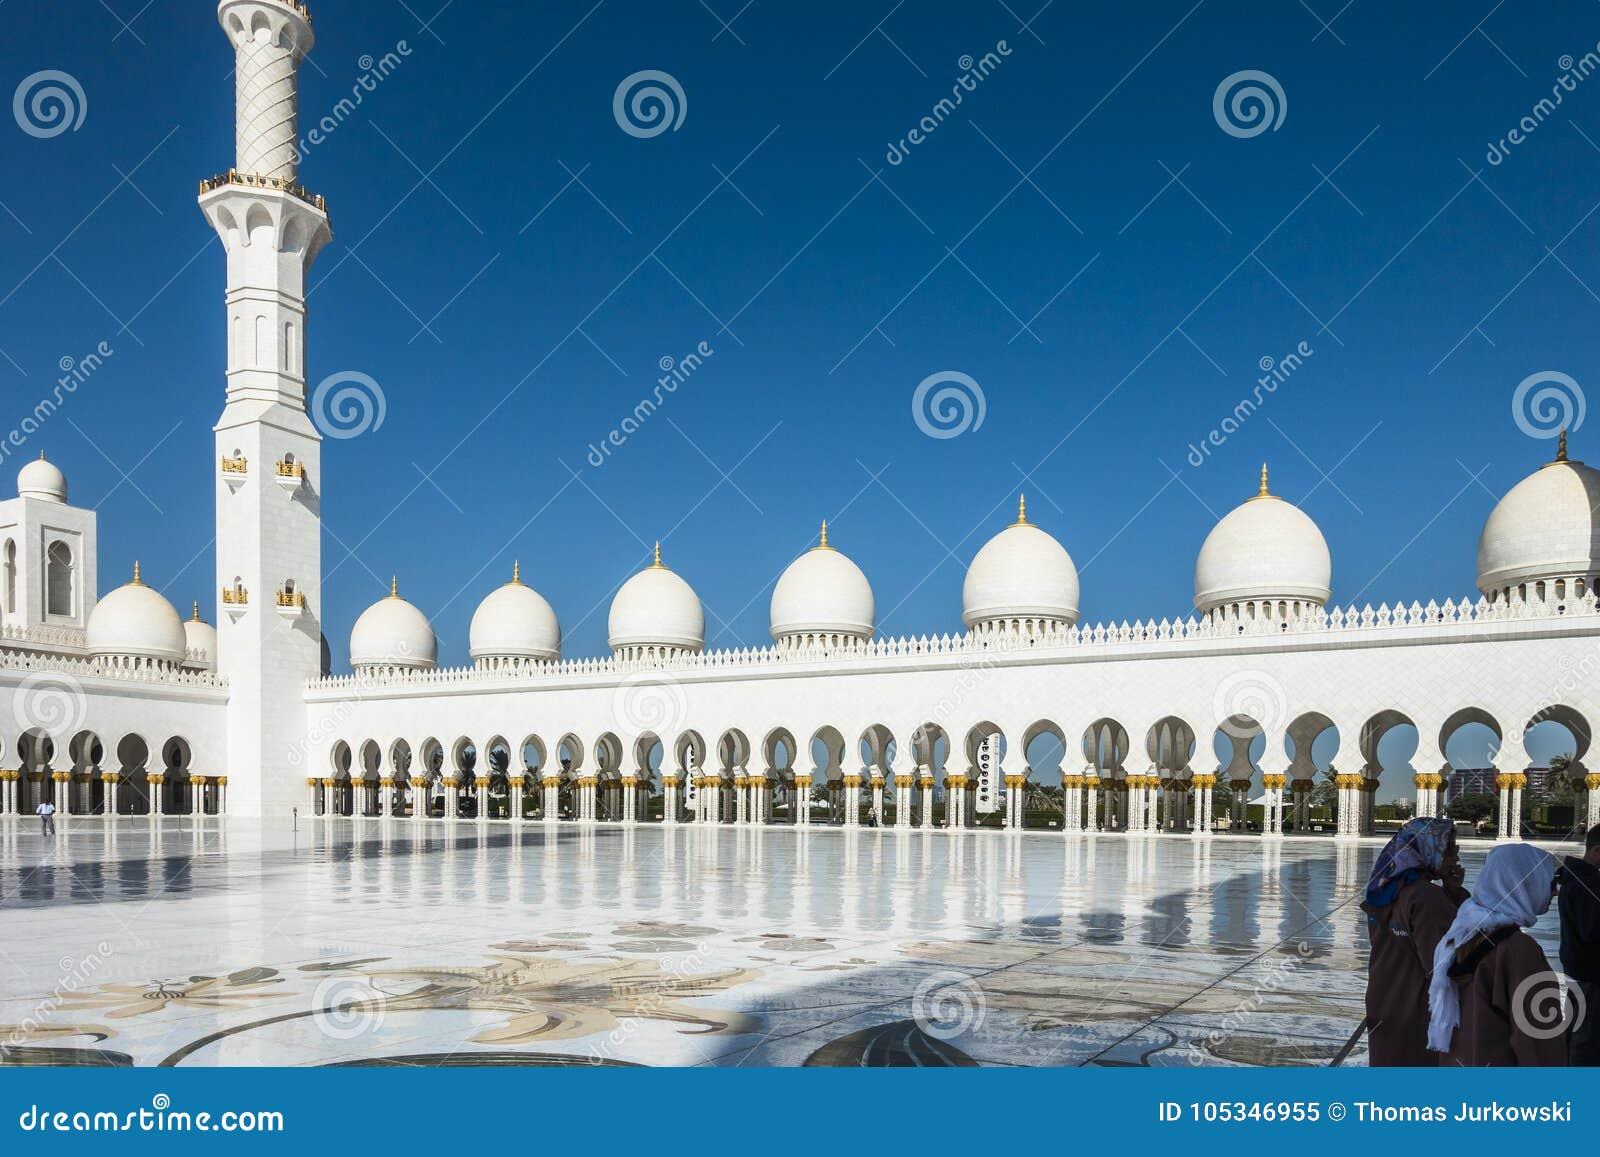 Dubaijumeirah Mosque Editorial Image Image Of Religion